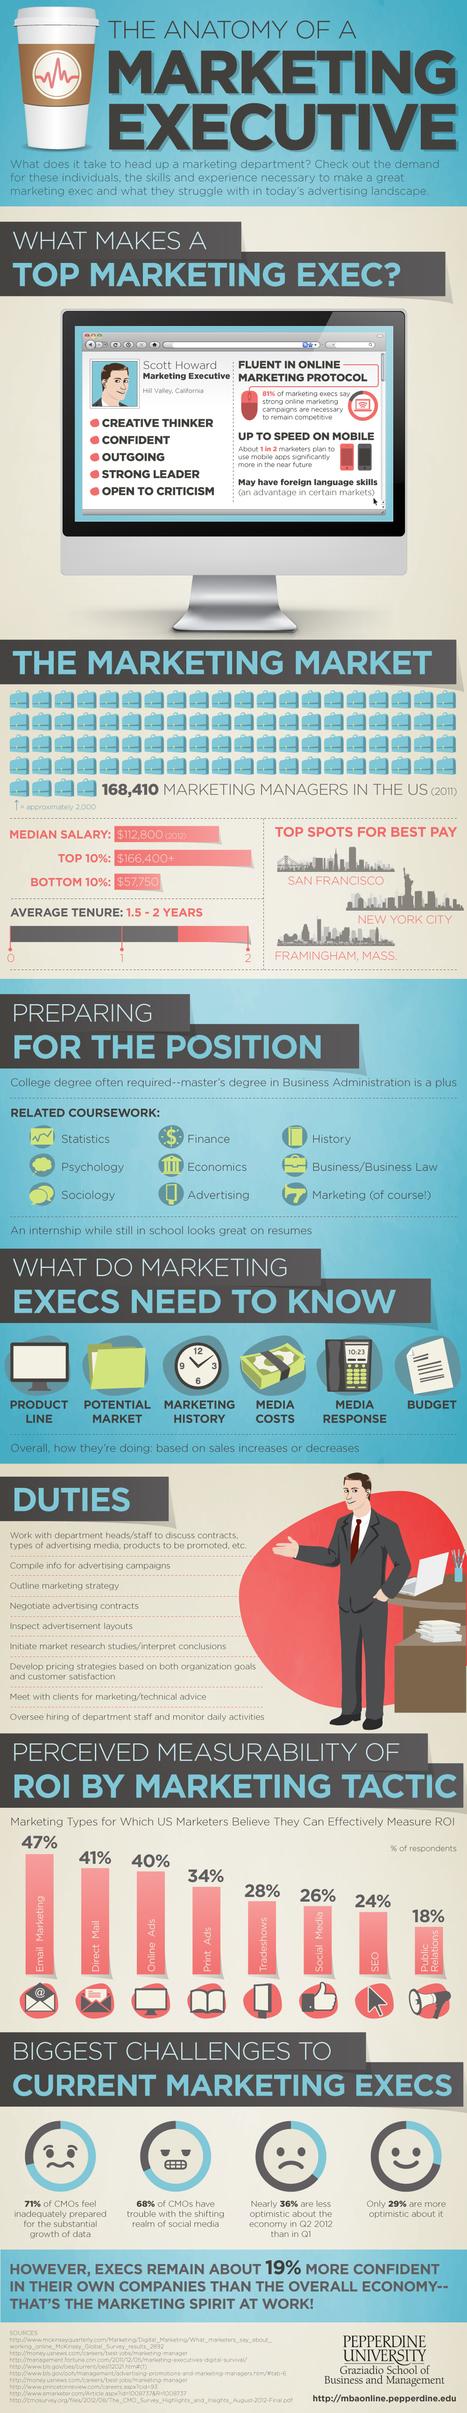 MBA Online Pepperdine » The Anatomy of a Marketing Executive | Marketing & Webmarketing | Scoop.it